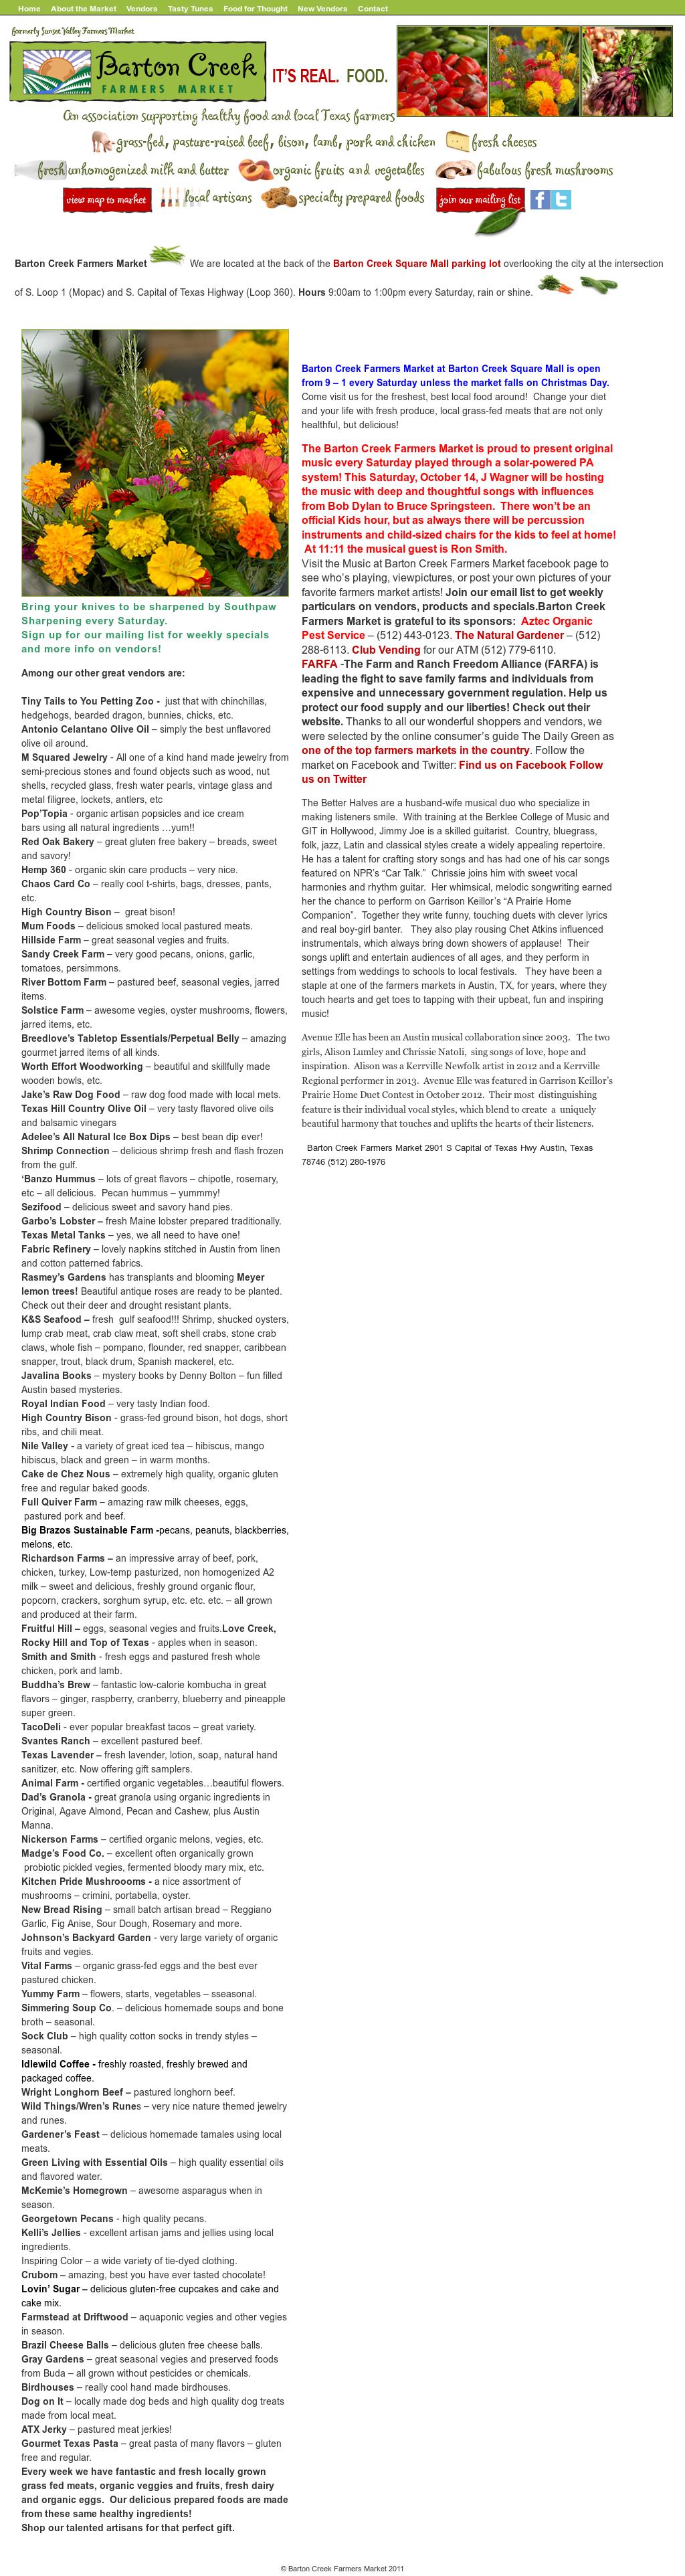 Barton Creek Farmers Market Competitors, Revenue and Employees ...